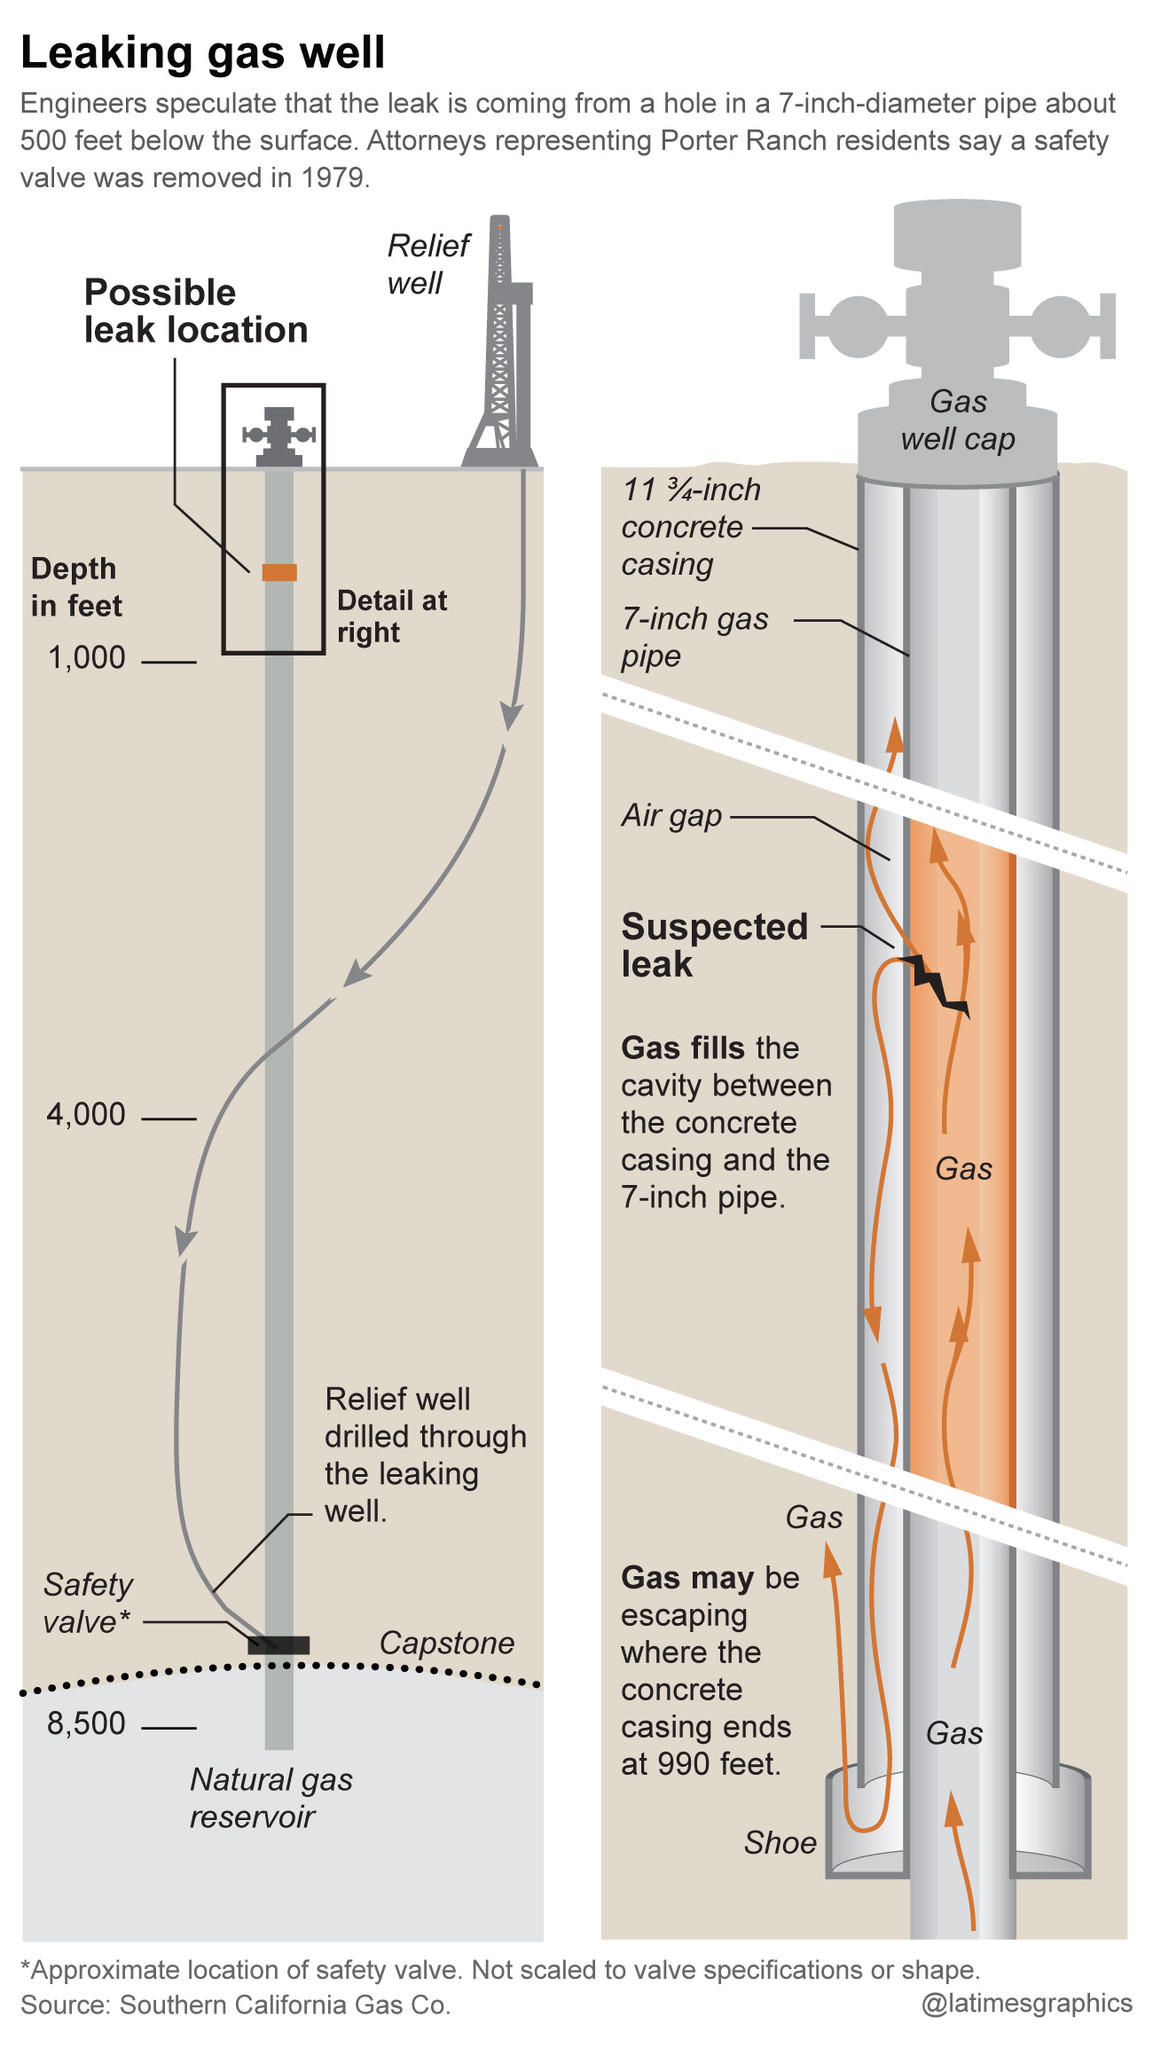 la-me-0104-gas-leak-lawsuit-20160103